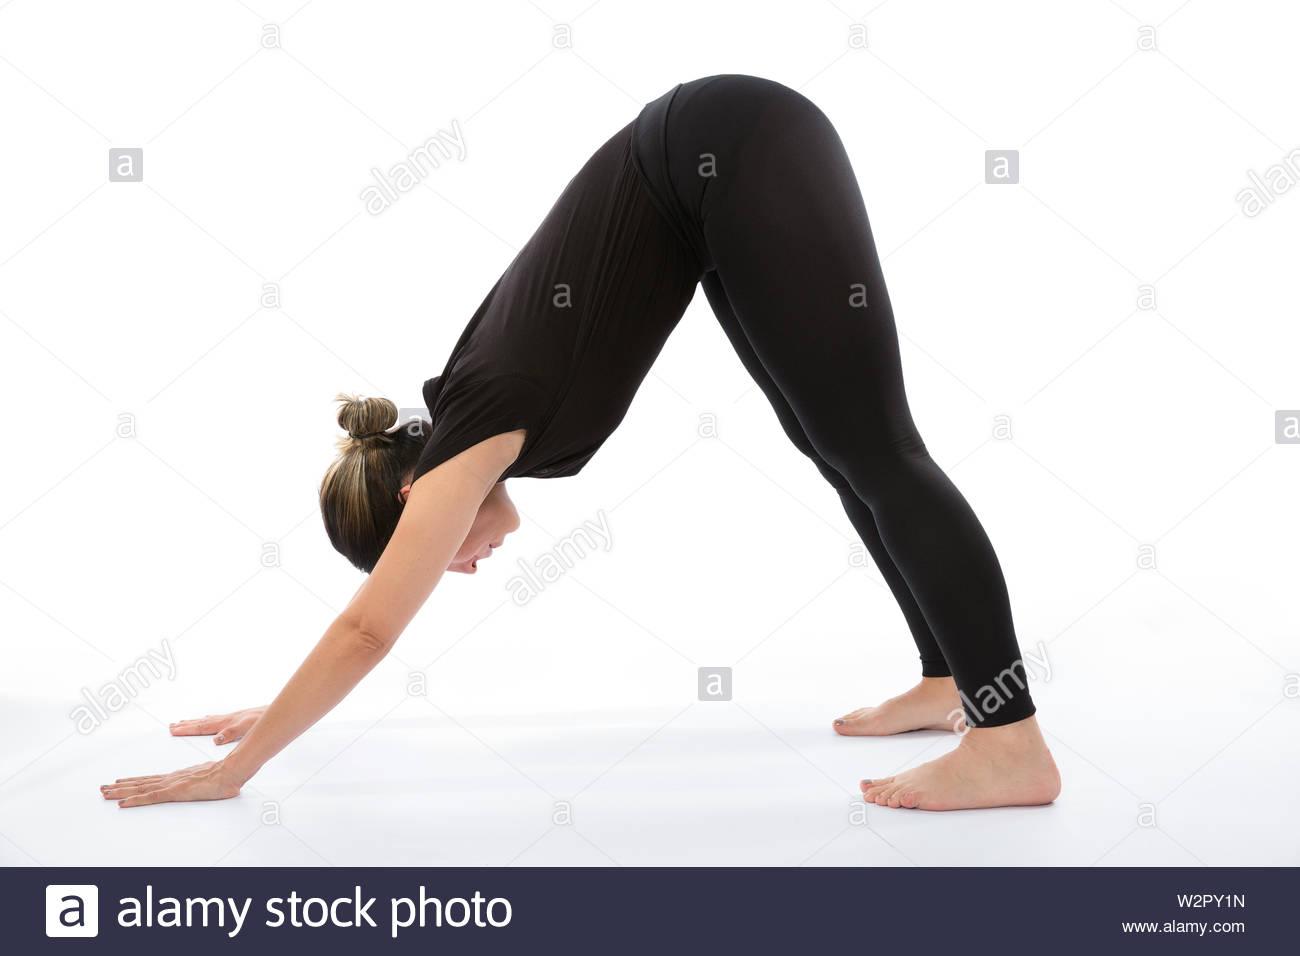 Adho Mukha Svanasana (Downward Dog pose). Yoga poses woman isolated with white background. Yoga pose set. Mindfulness and Spiritually concept. Girl pr - Stock Image